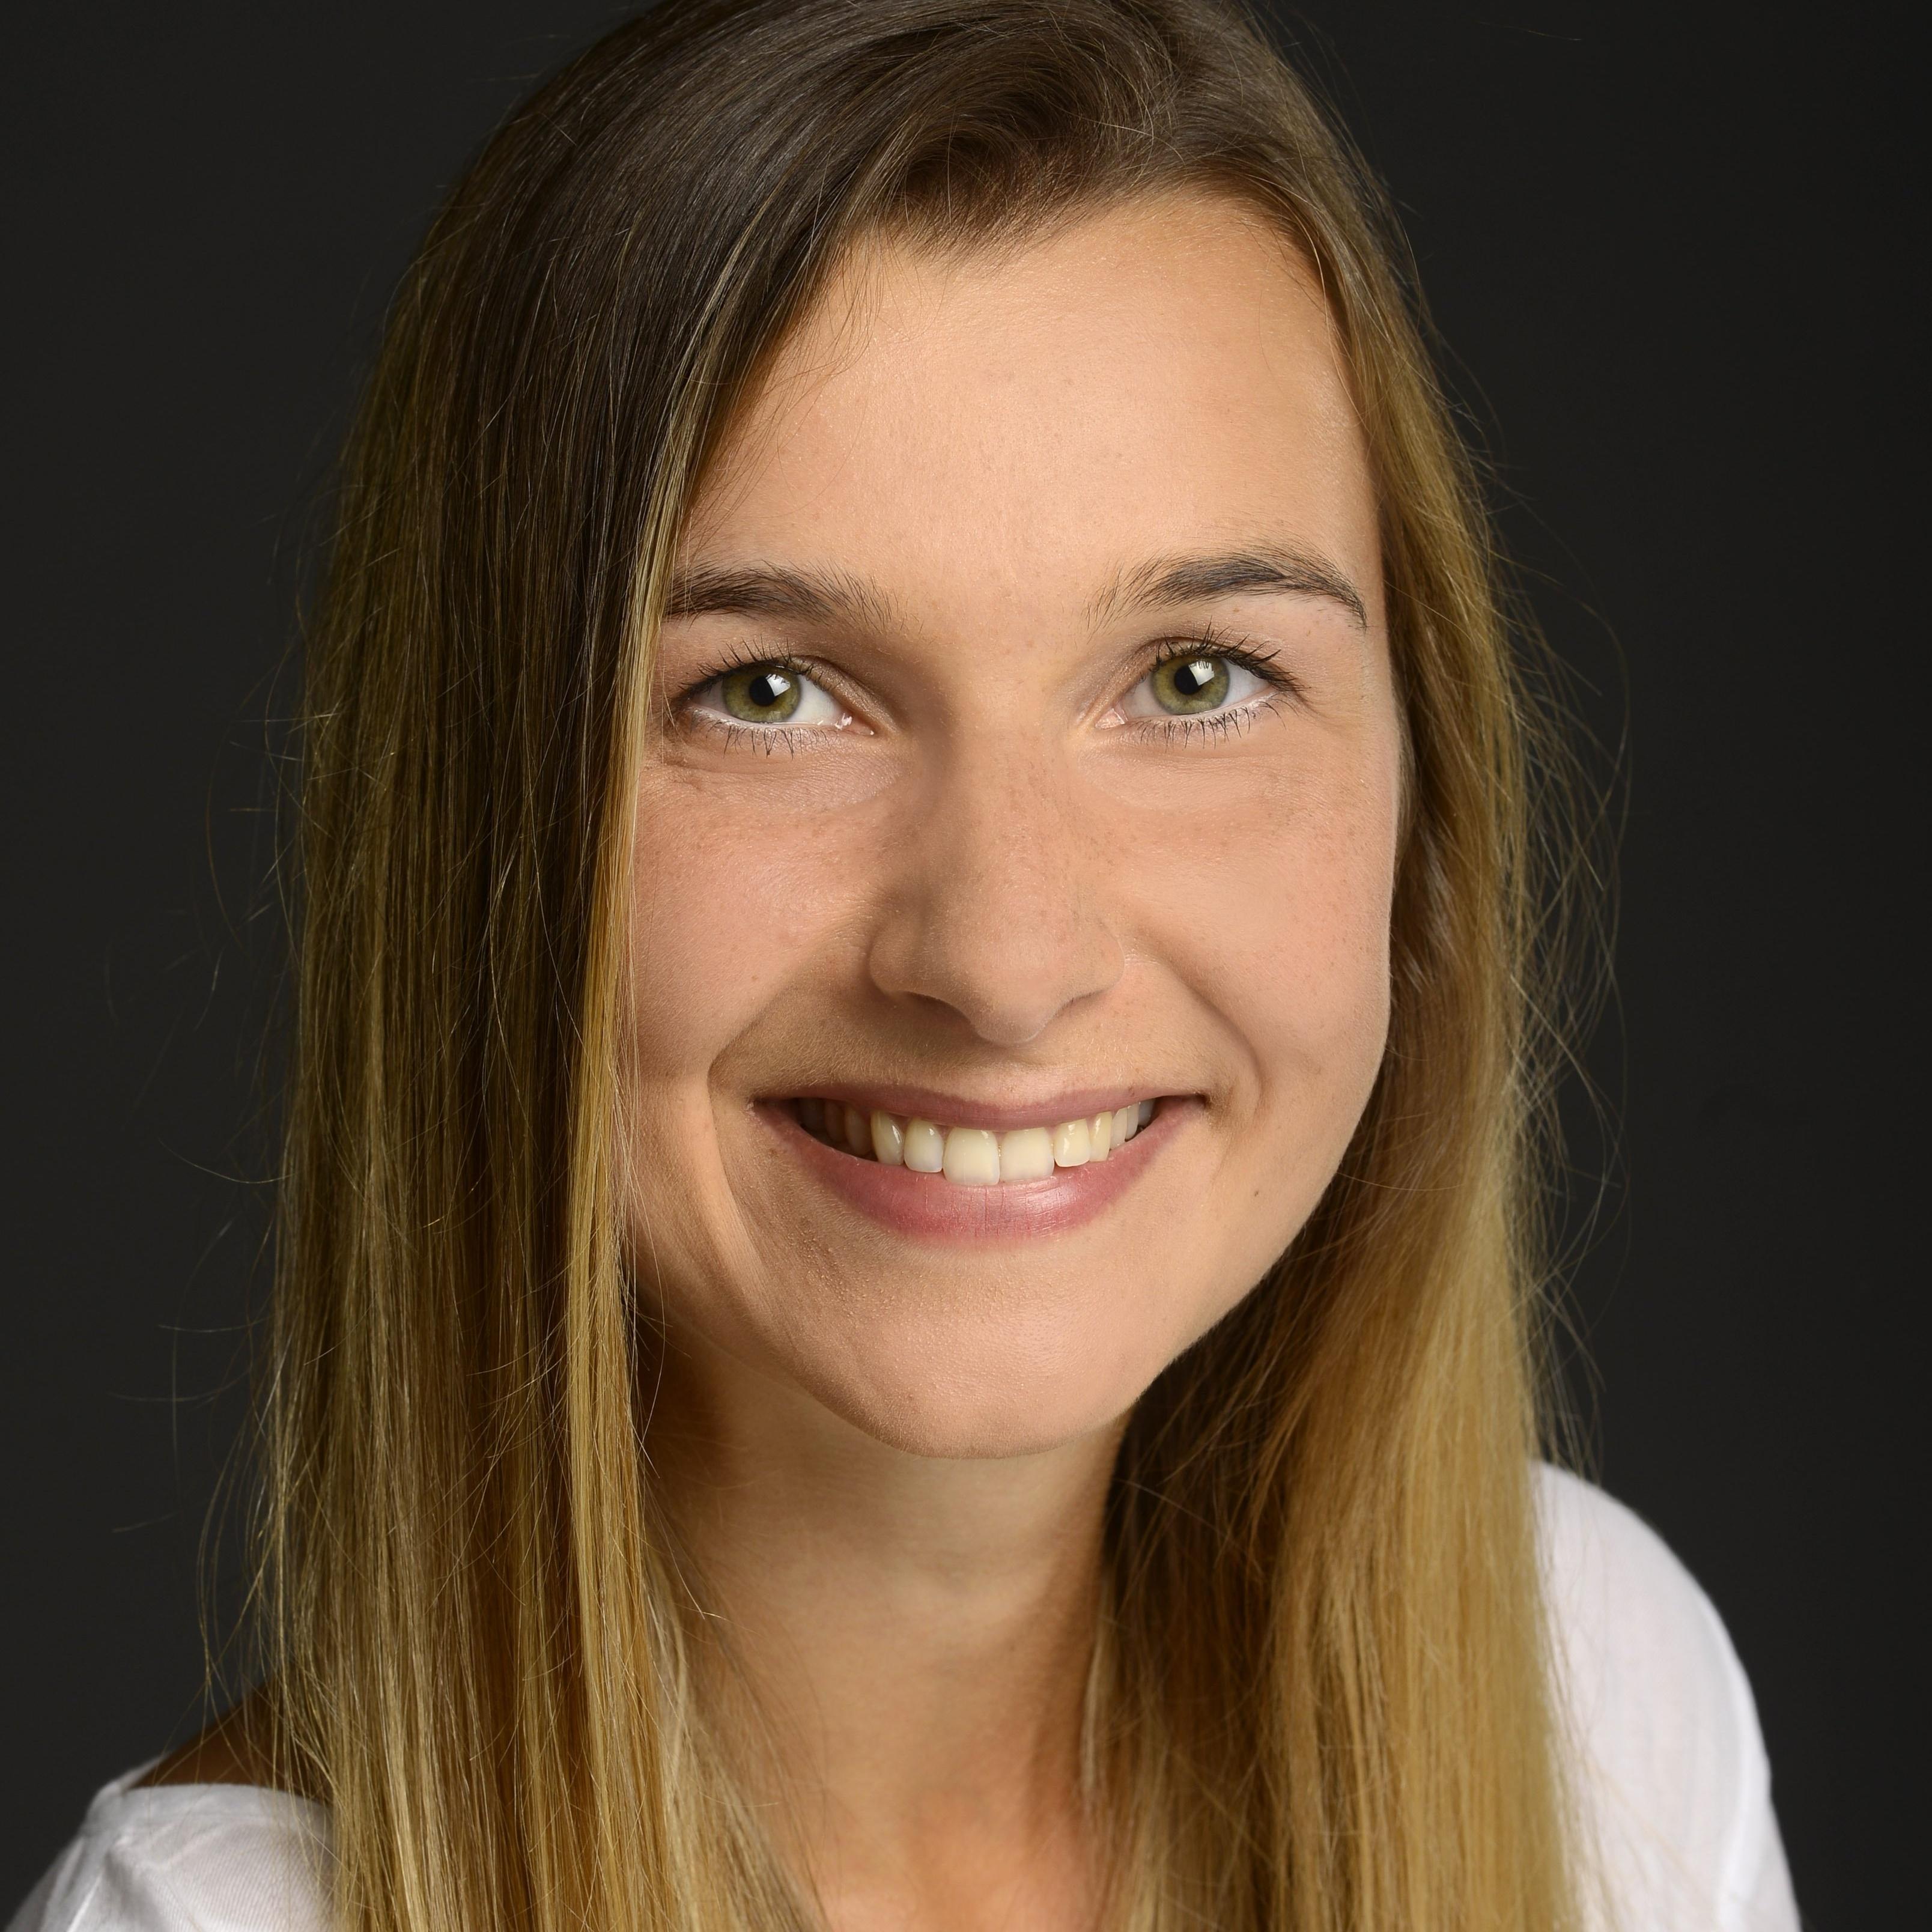 Caroline Schmidt